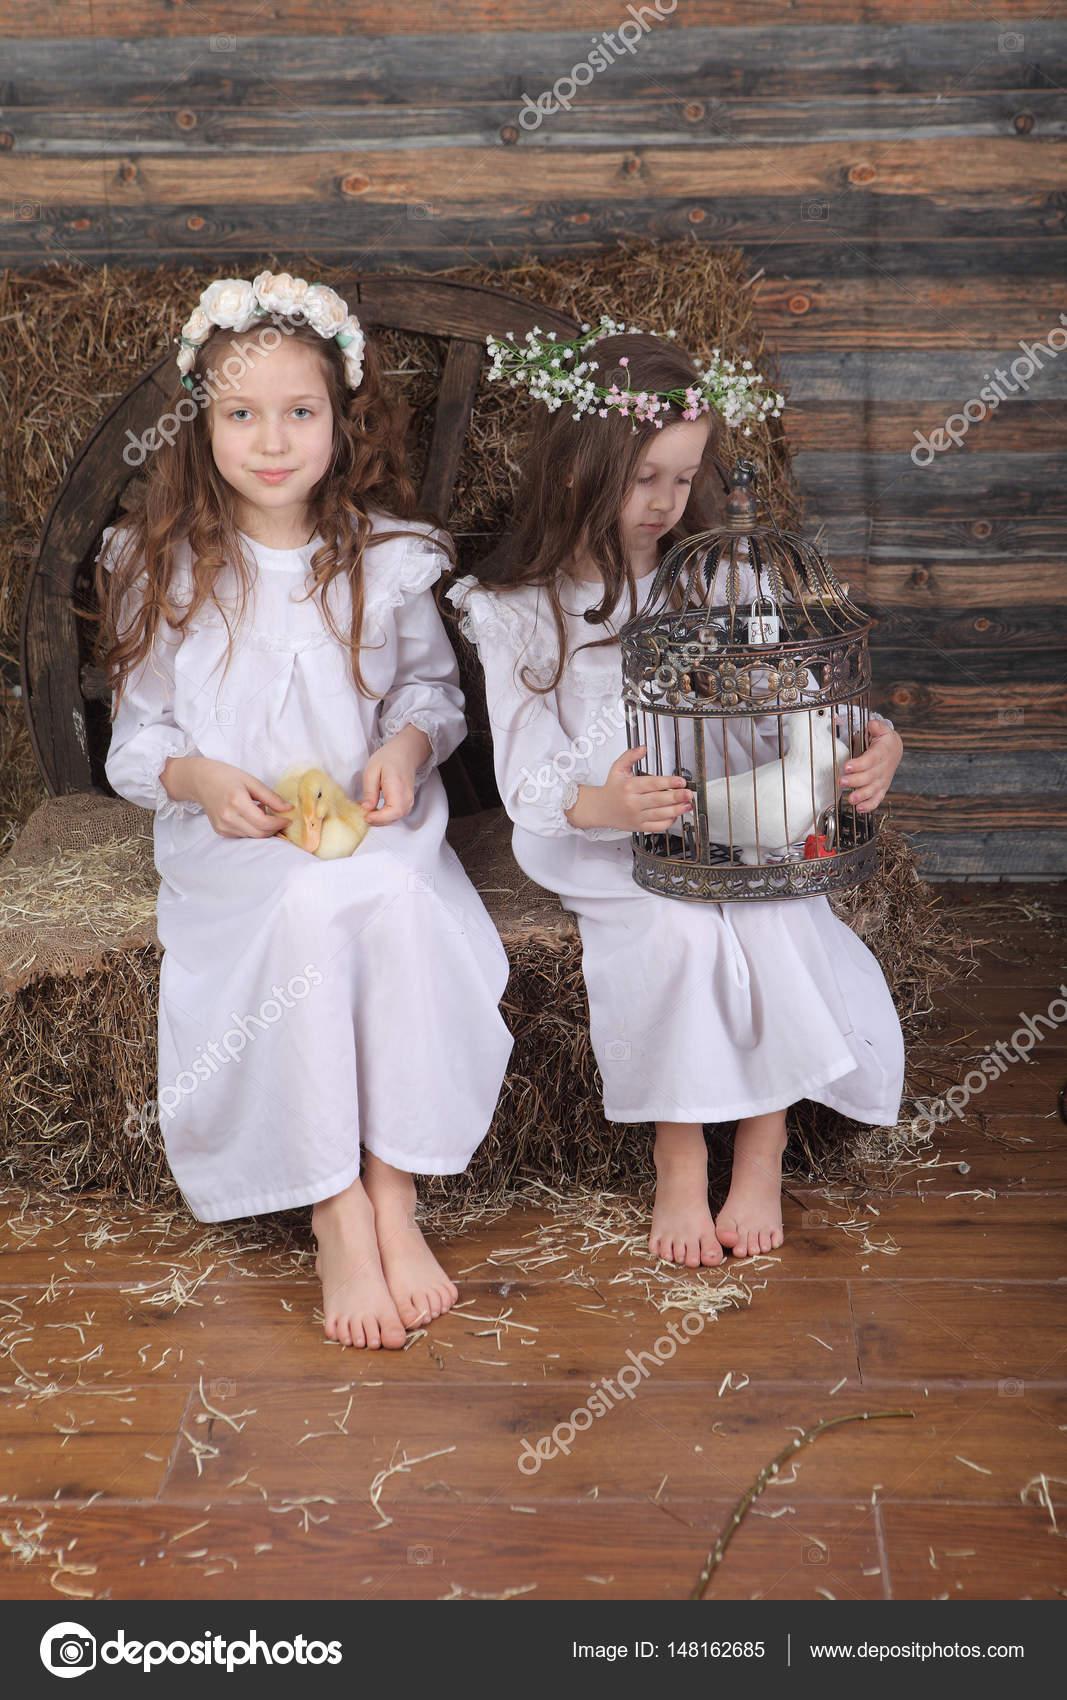 22272dc0f62f Δύο κορίτσια φίλες διεξάγουμε μια ζωντανή πάπια και ένα κλουβί με ένα–  εικόνα αρχείου